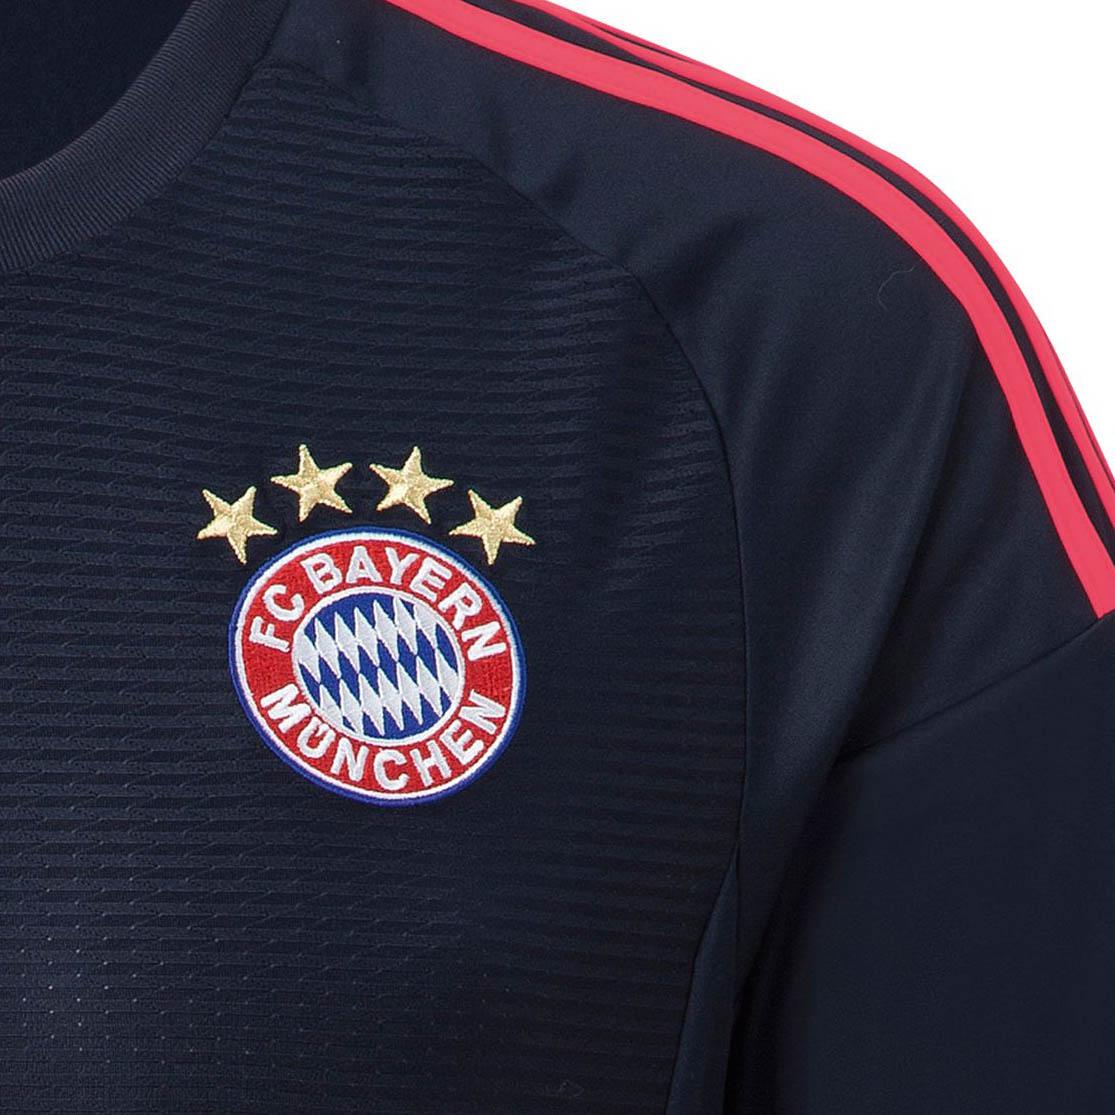 bayern münchen champions league 2019